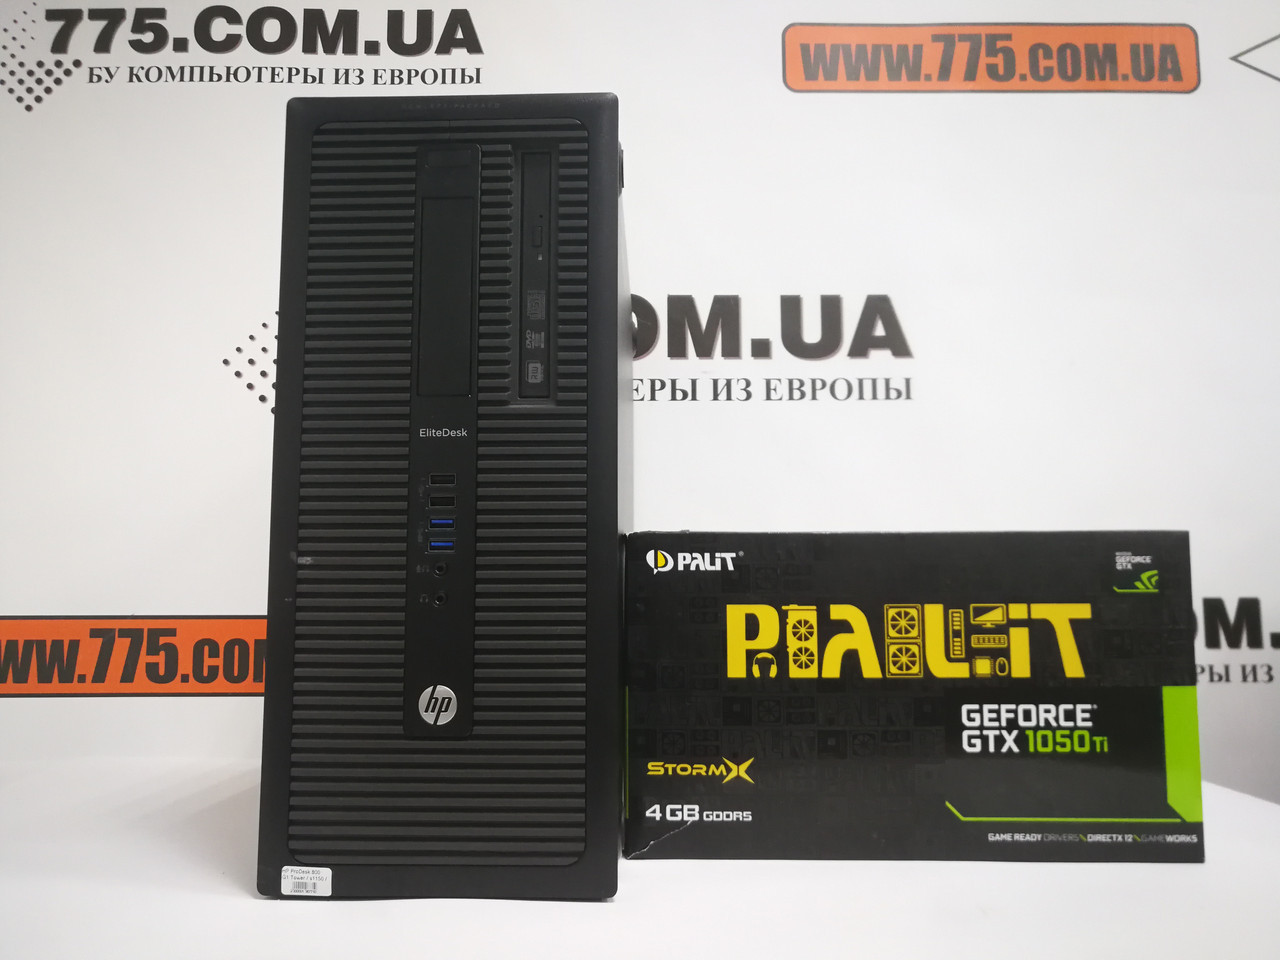 Компьютер HP 800 G1 (Tower), Intel Core i5-4570 3.6GHz, RAM 8ГБ, SSD 120GB + HDD 500ГБ, GeForce GTX 1050Ti 4ГБ